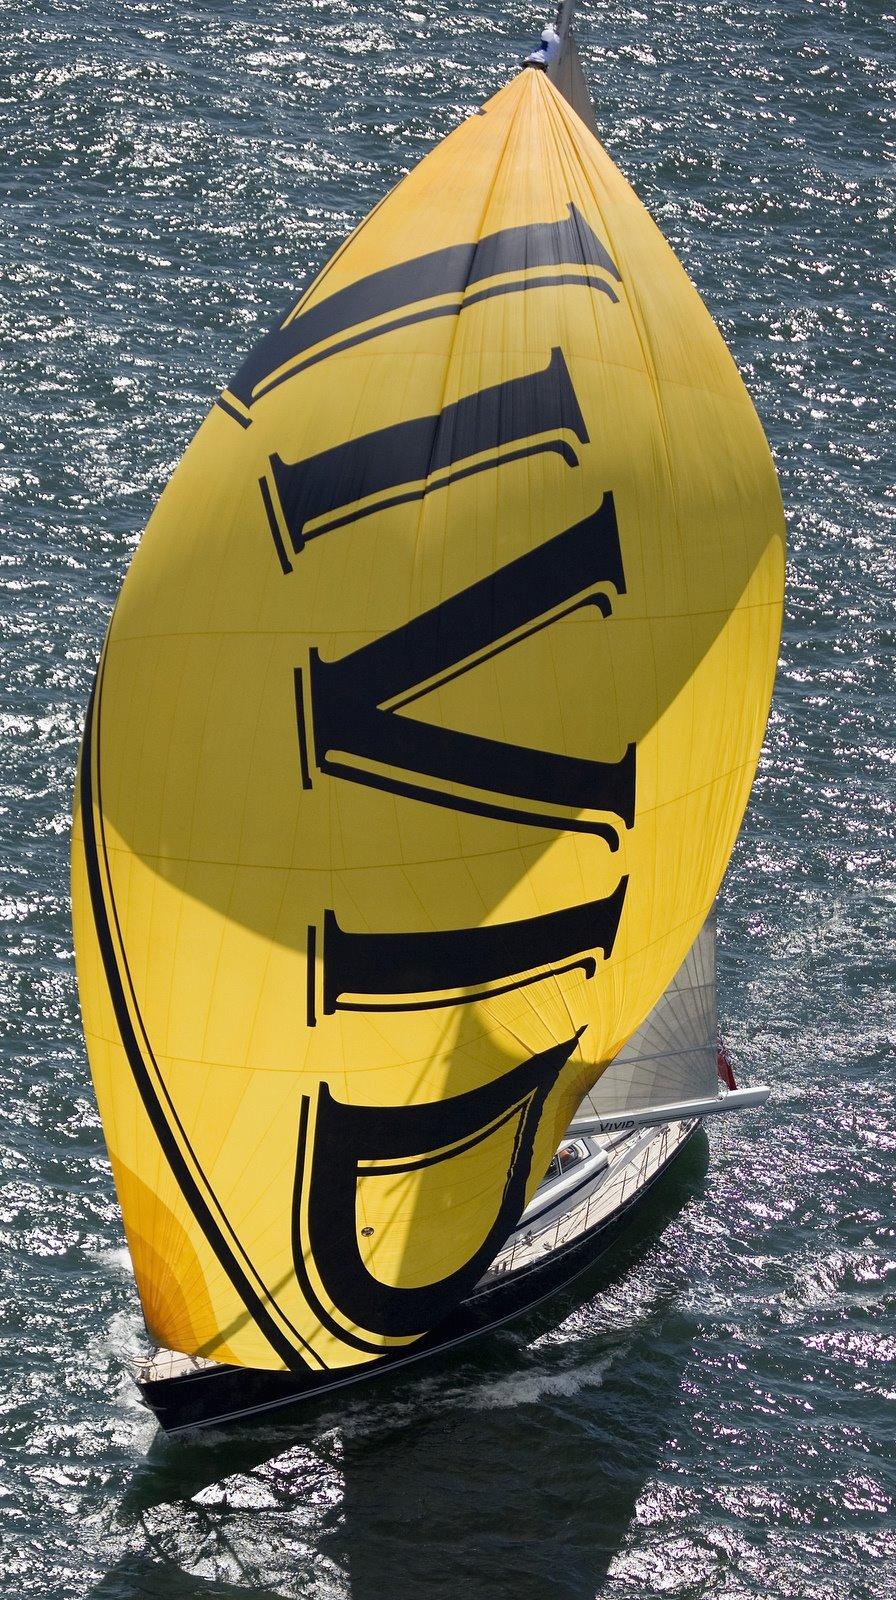 27m sailing yacht Vivid by Jongert - Courtesy of Andrea Francolini